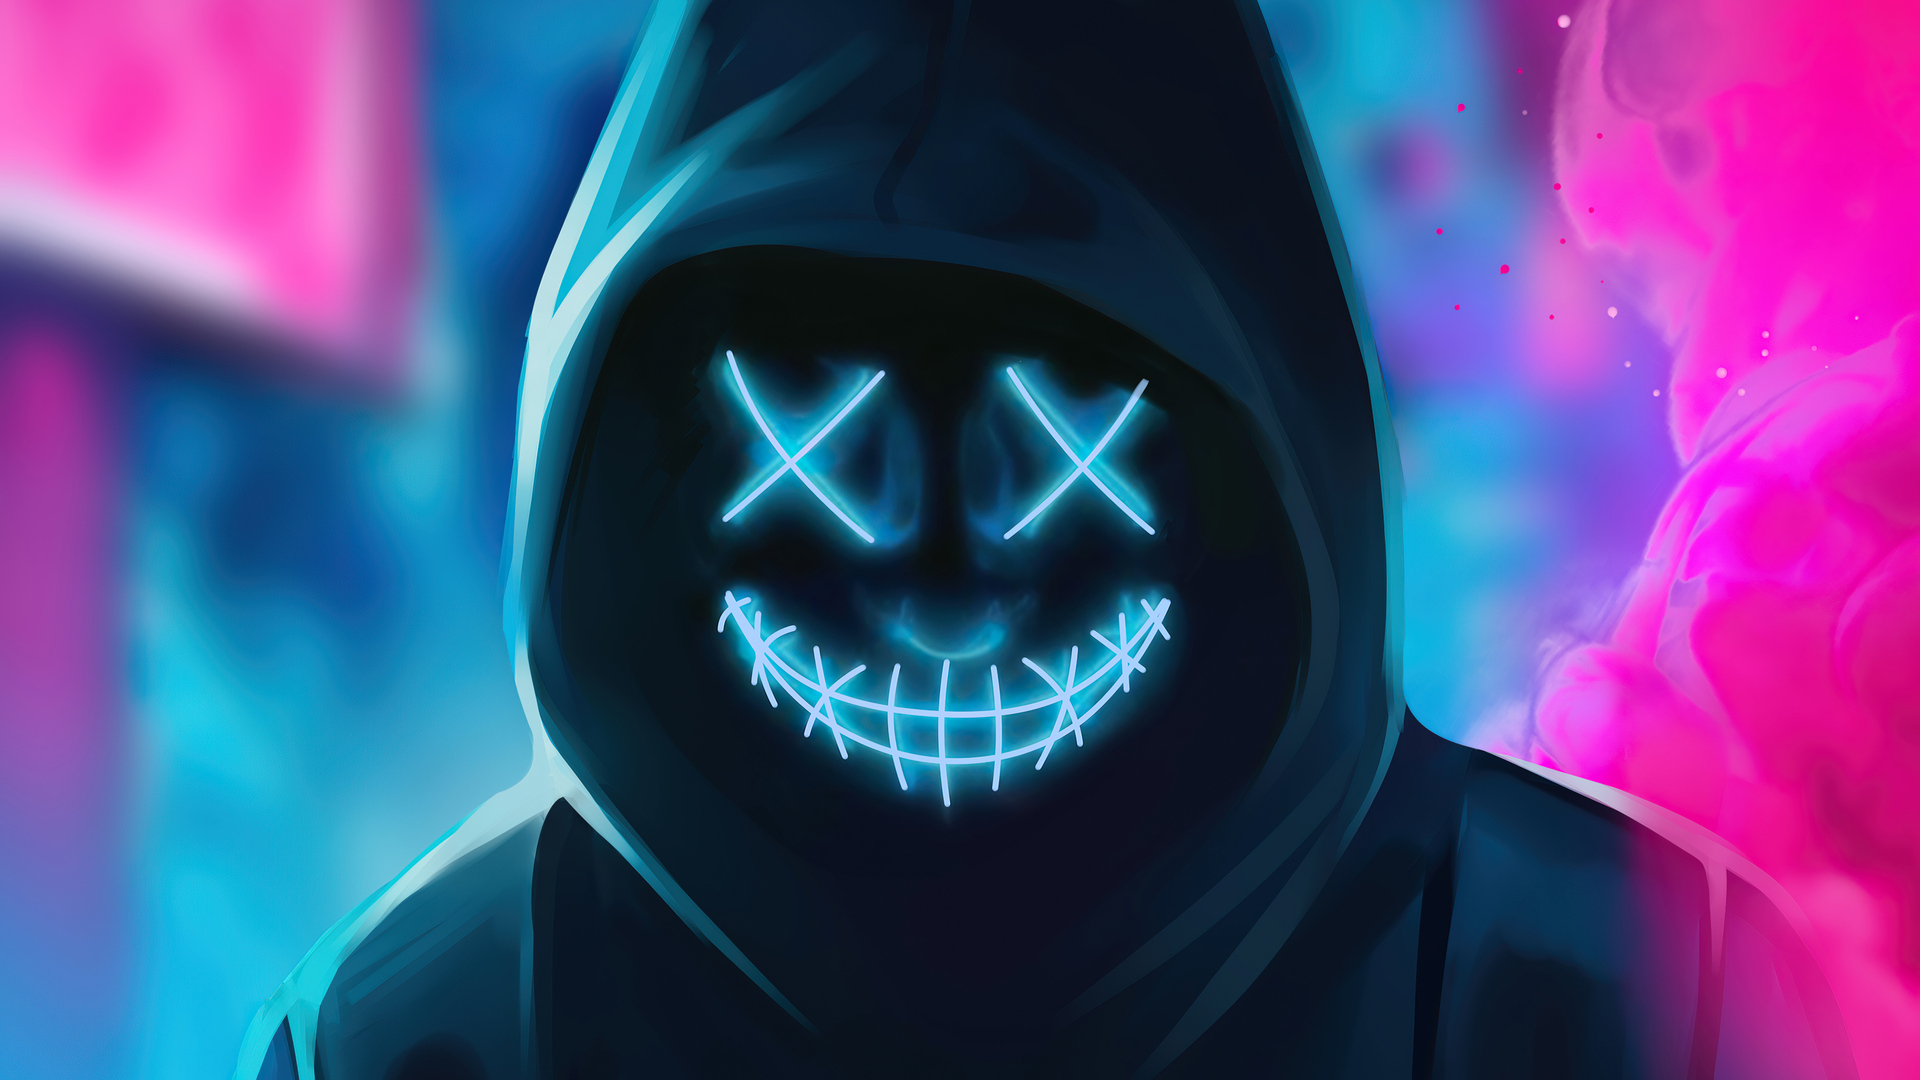 1920x1080 Neon Guy Mask Smiling 4k Laptop Full HD 1080P HD ...